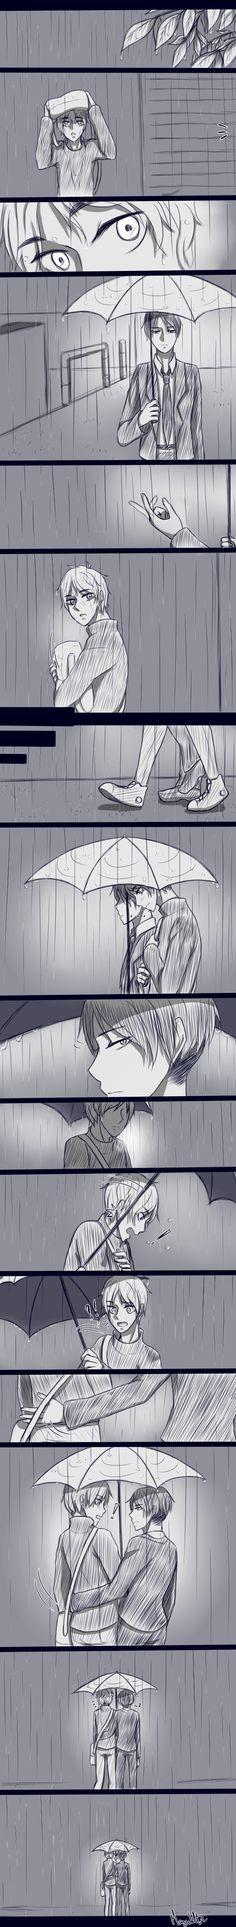 Rain~ by magickitt on DeviantArt